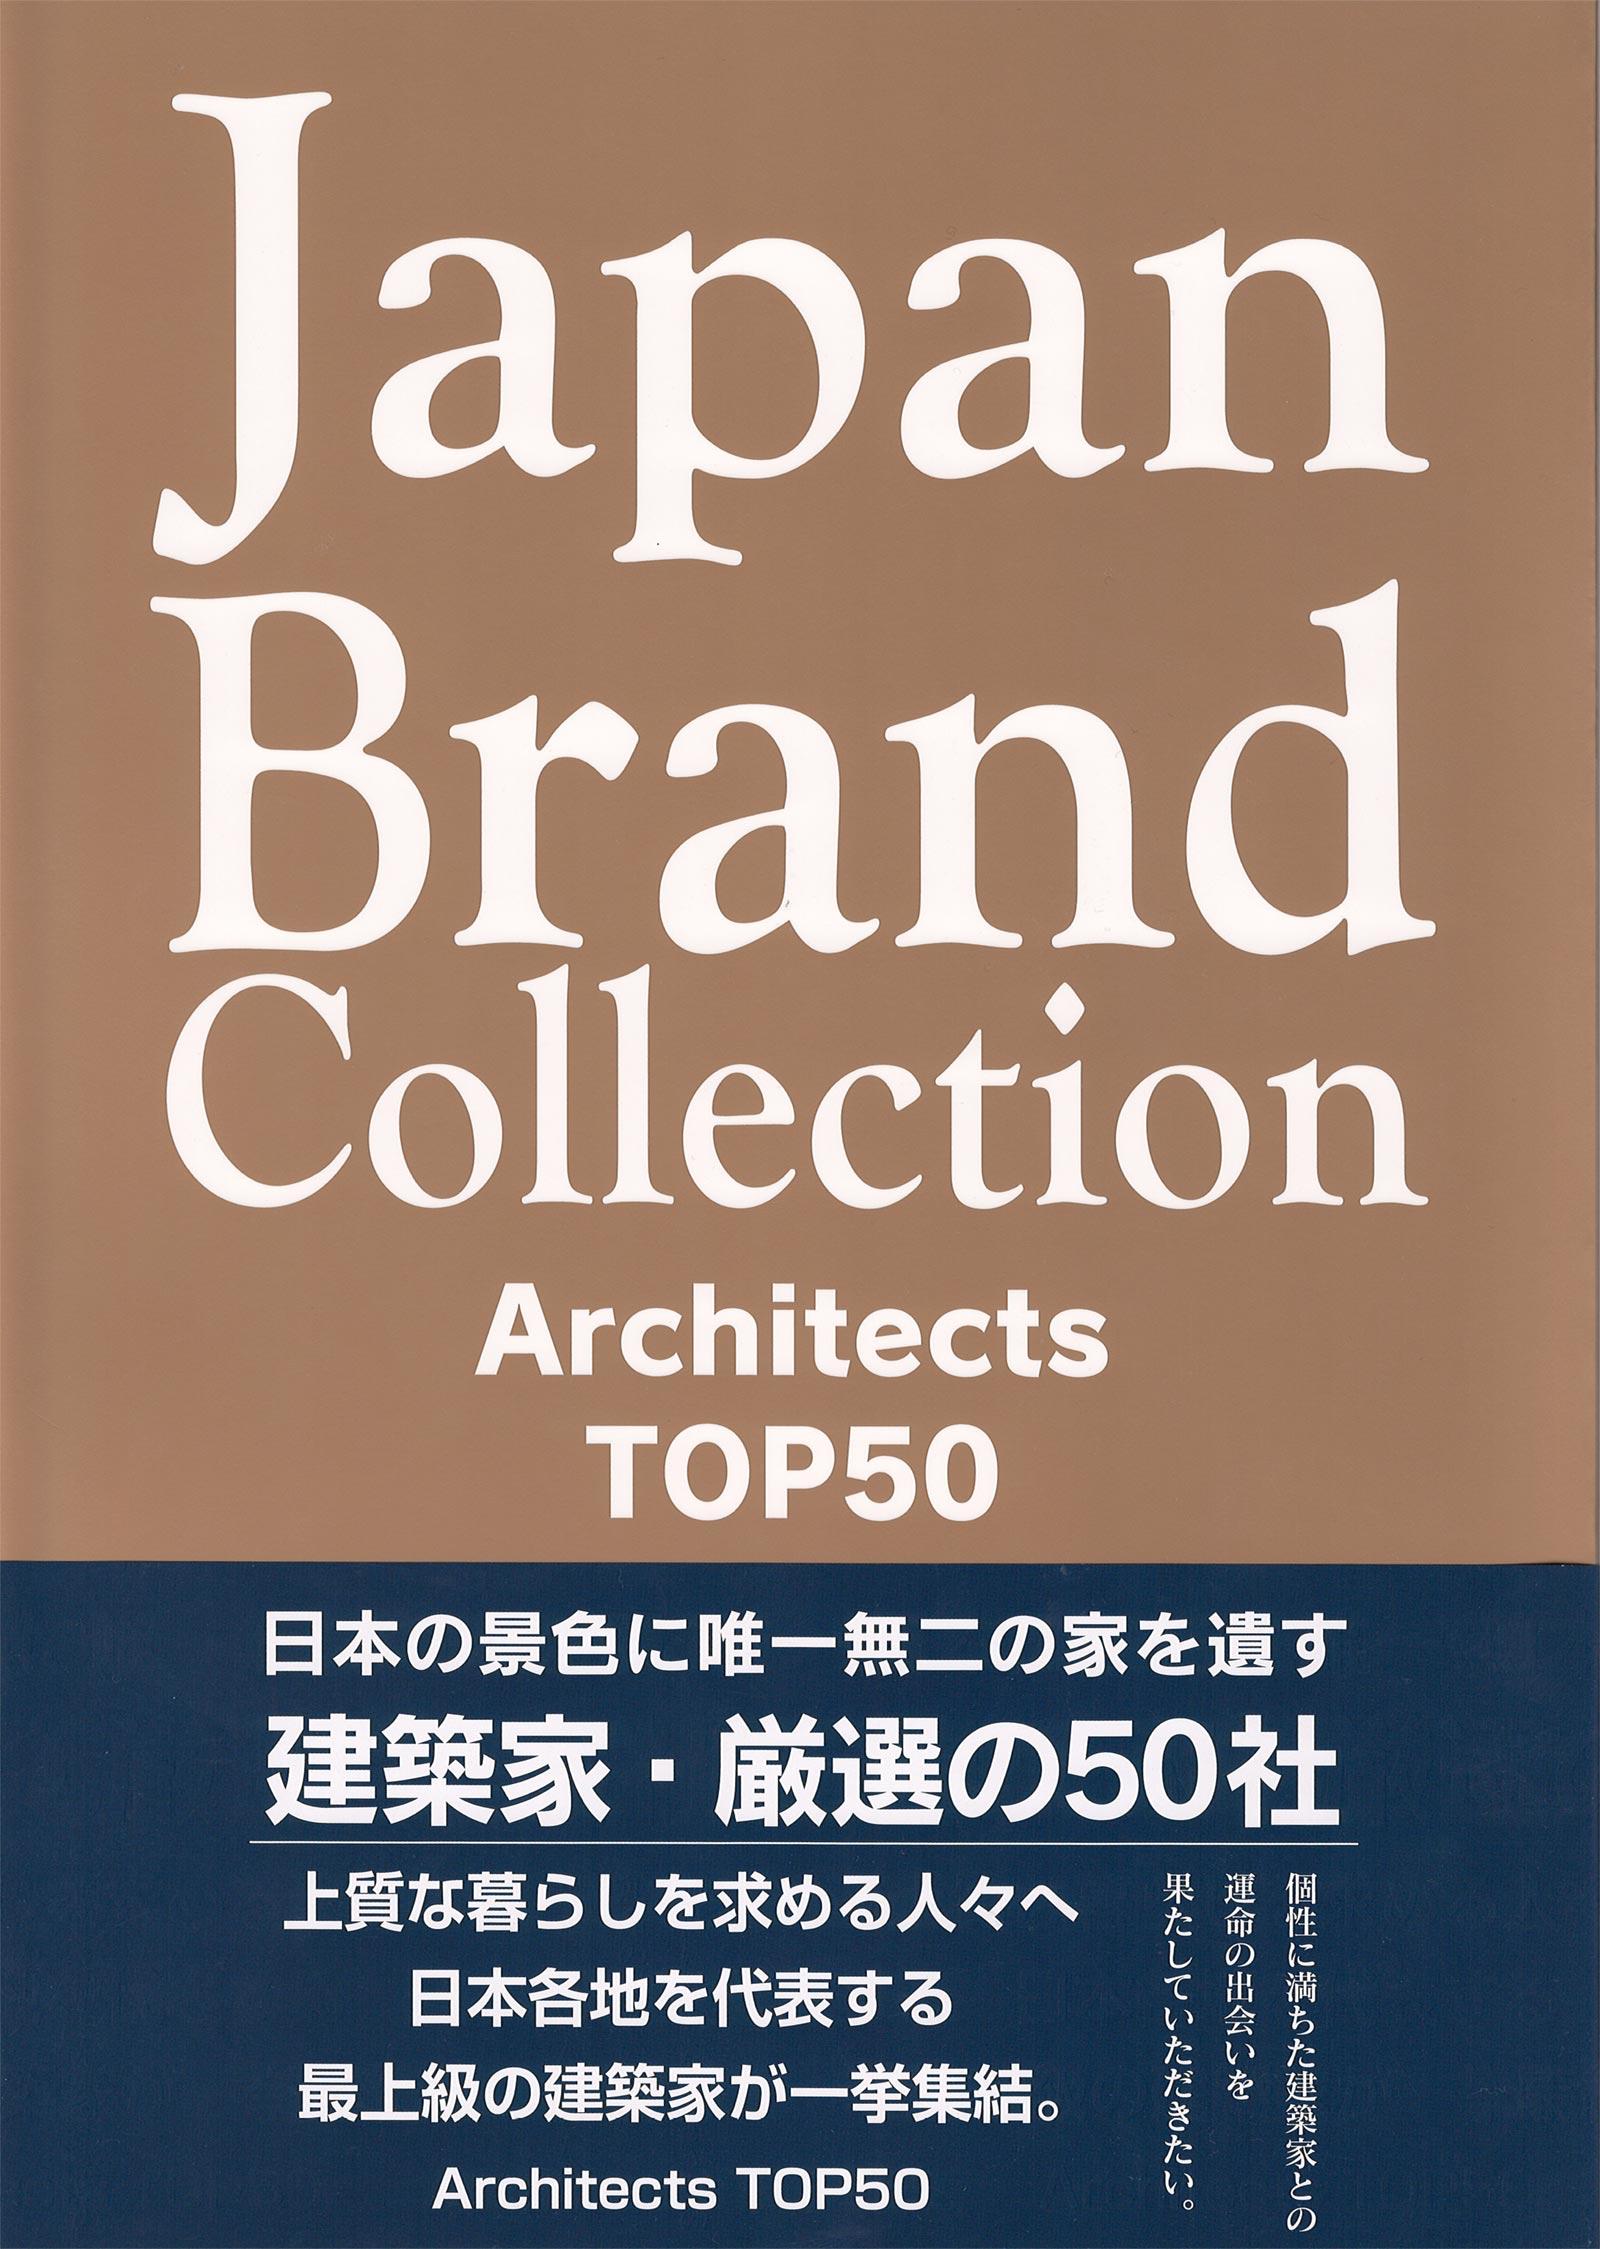 Japan Brand Collection 兵庫県版